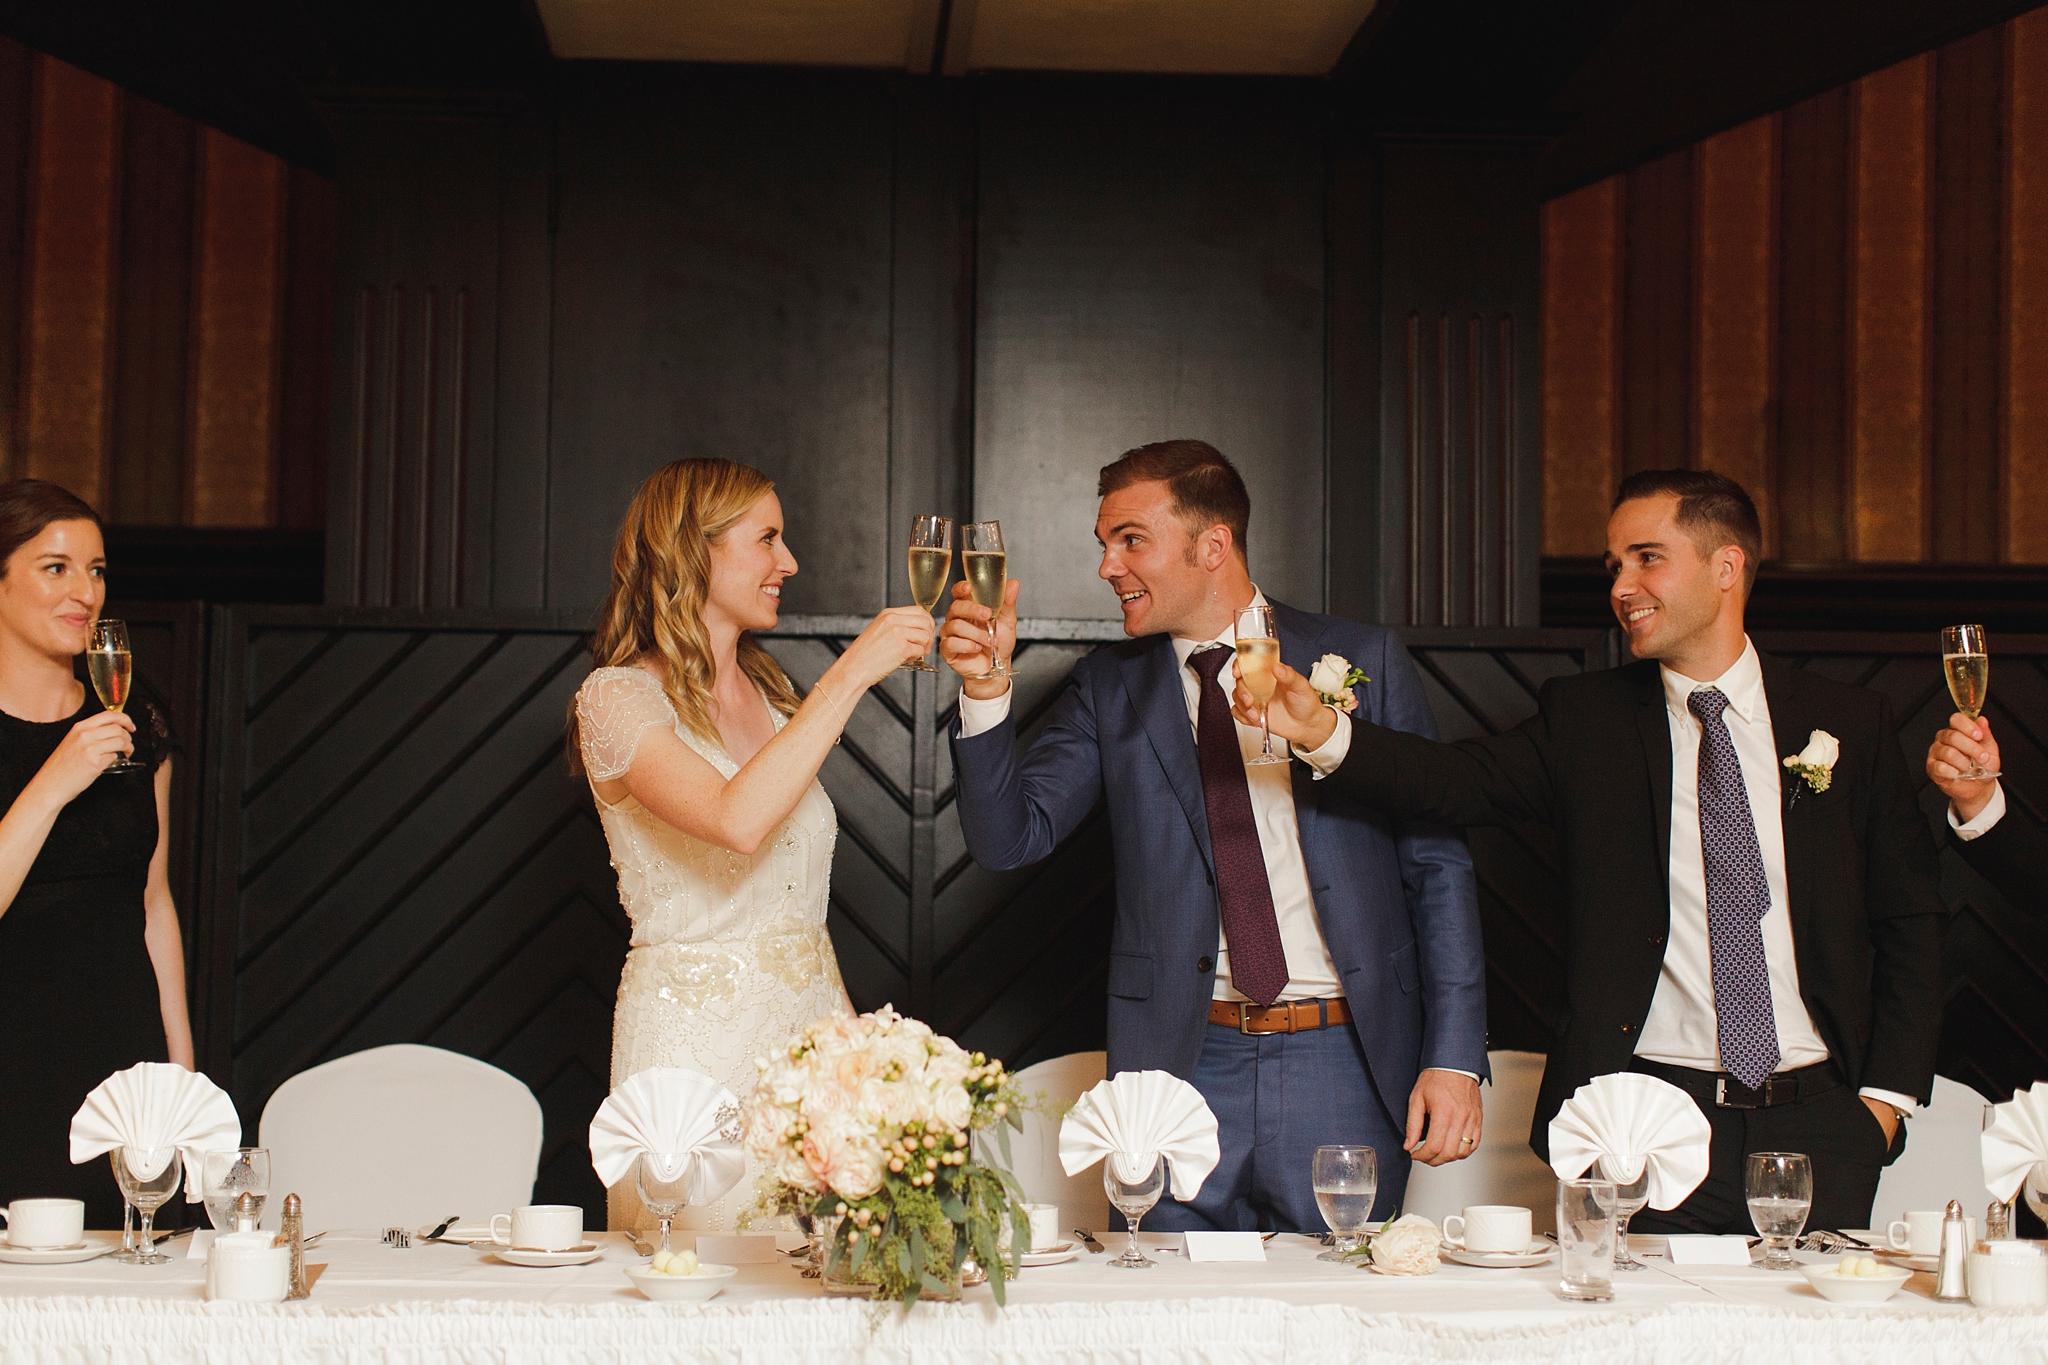 KateColin-WEDDING-highlights-4410.jpg